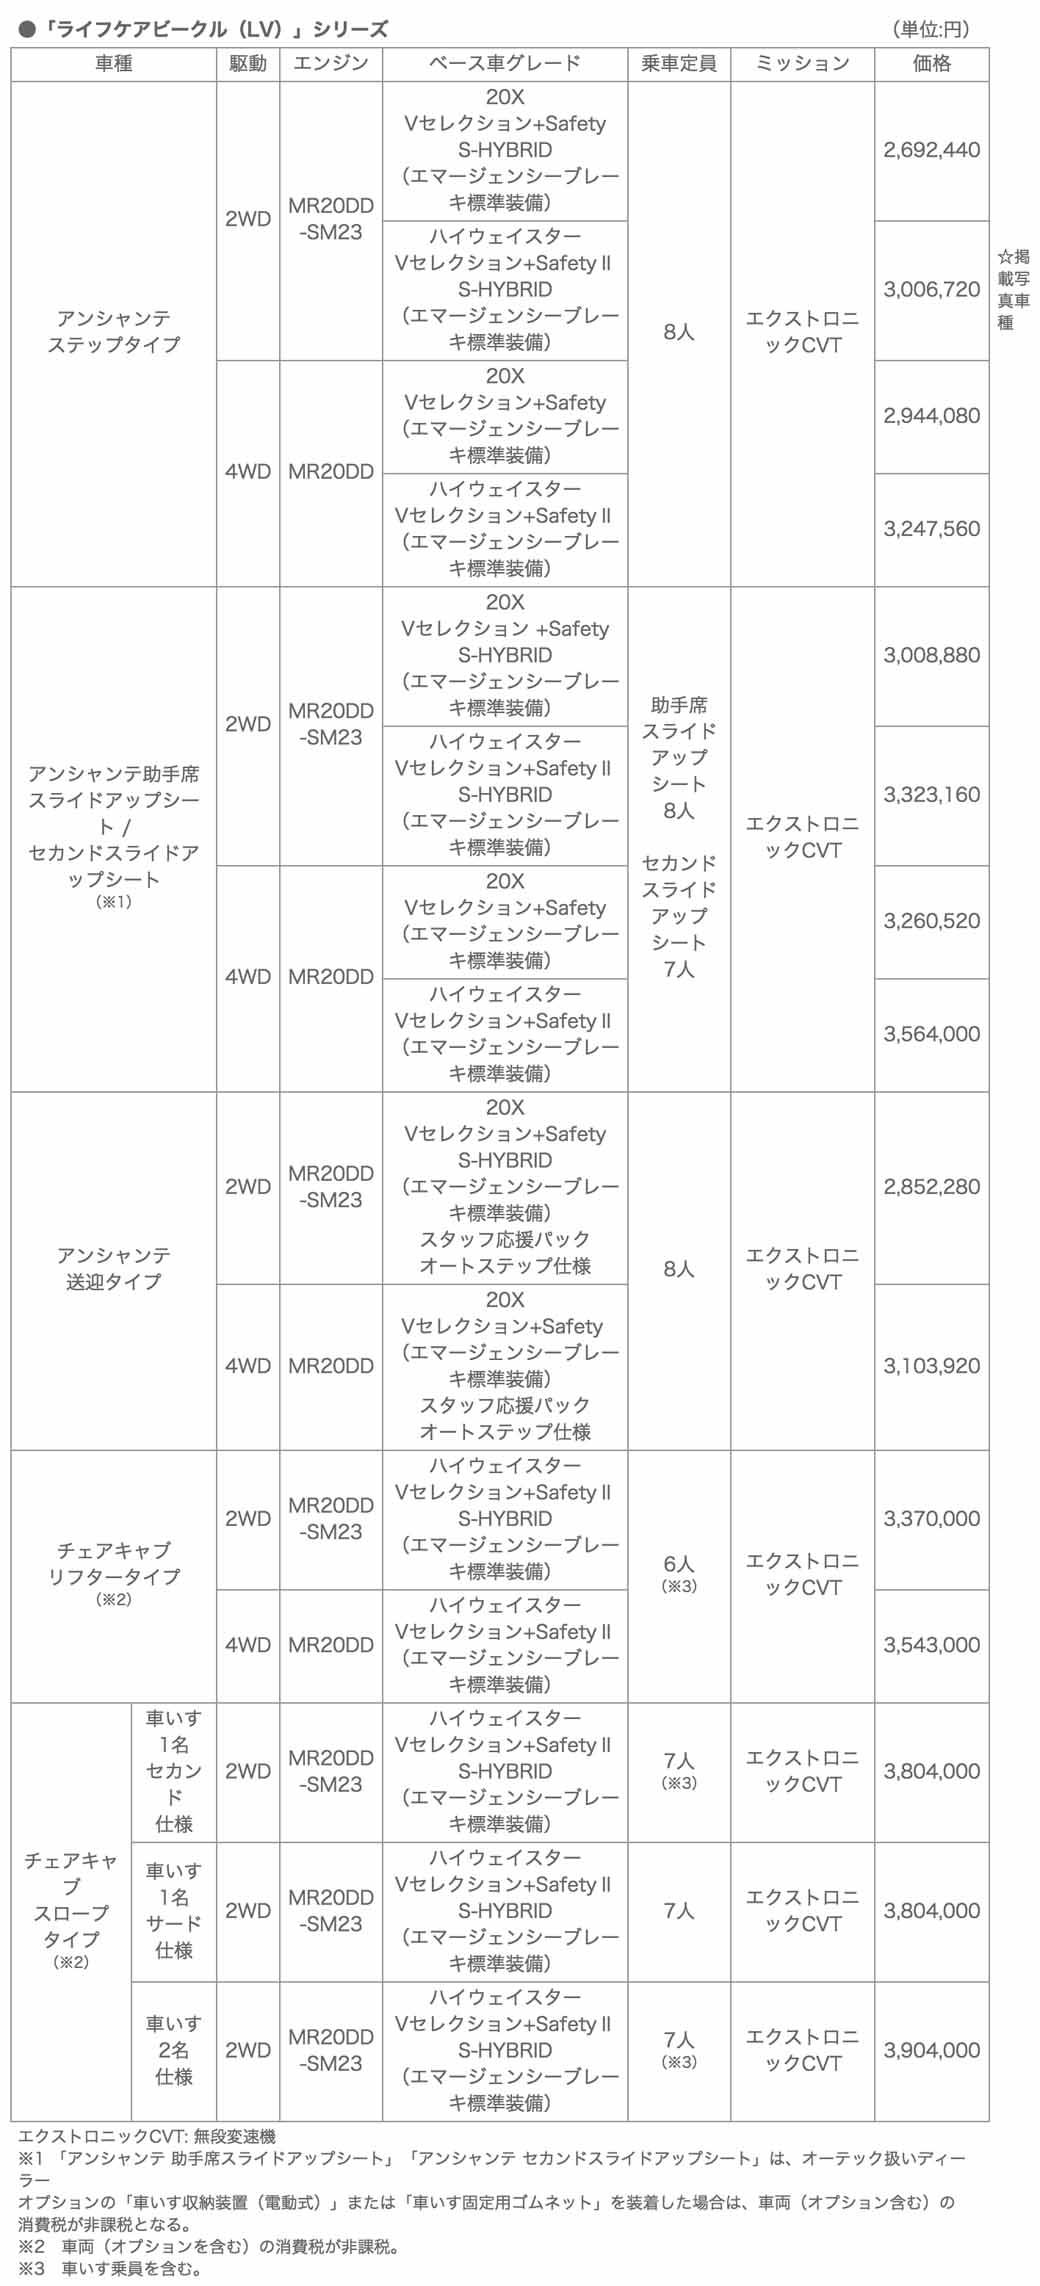 autech-japan-nissan-serena-custom-rider-lv-series-added-new-models20150715-4-min